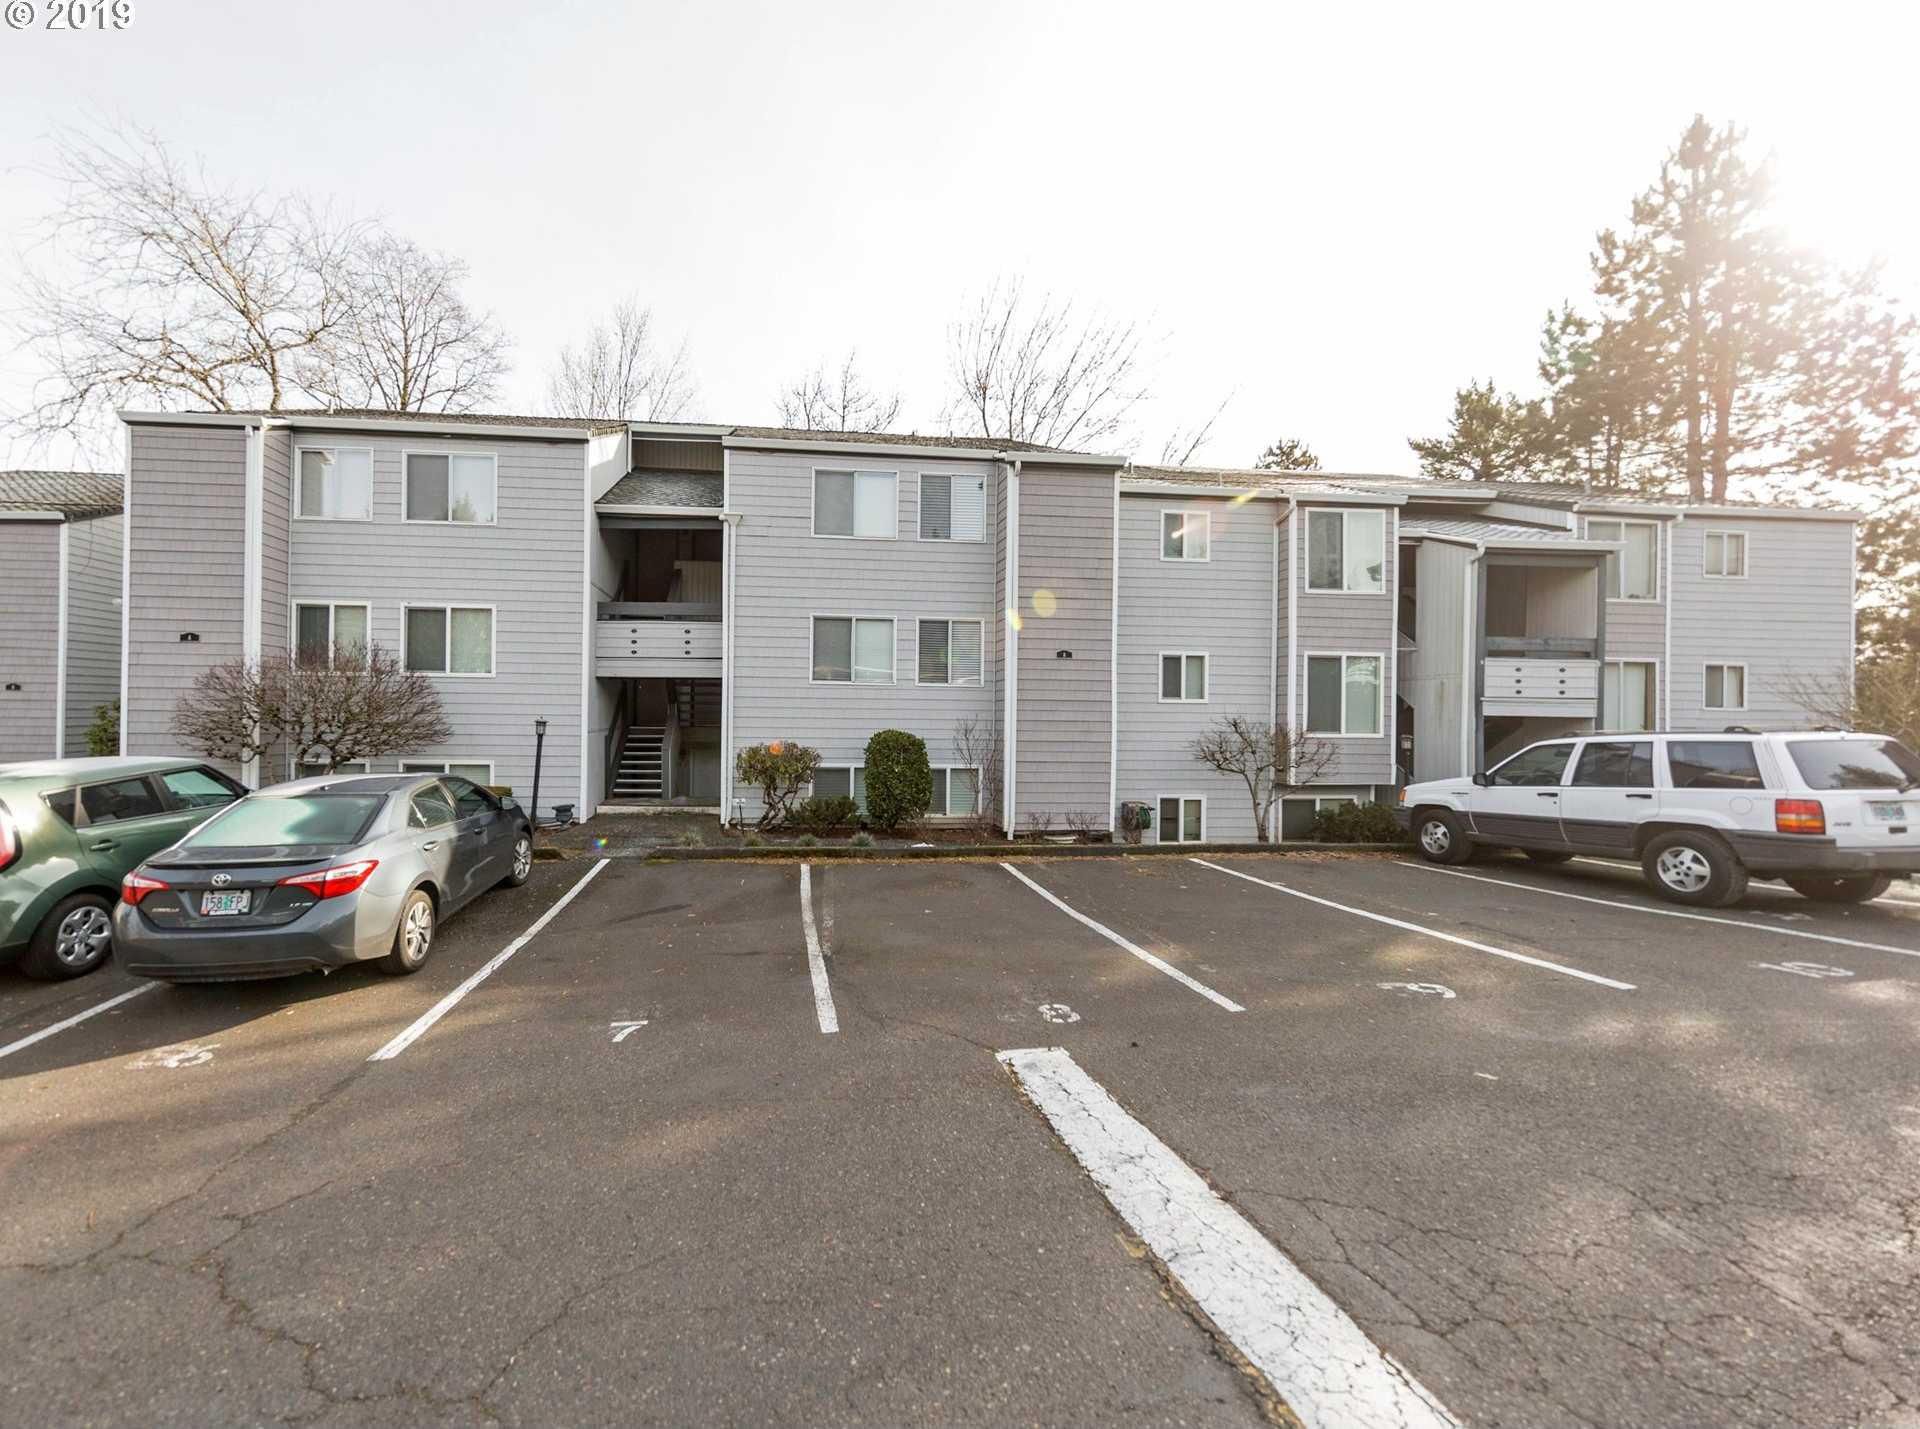 $206,900 - 2Br/1Ba -  for Sale in Ridgeview Condominiums, Lake Oswego